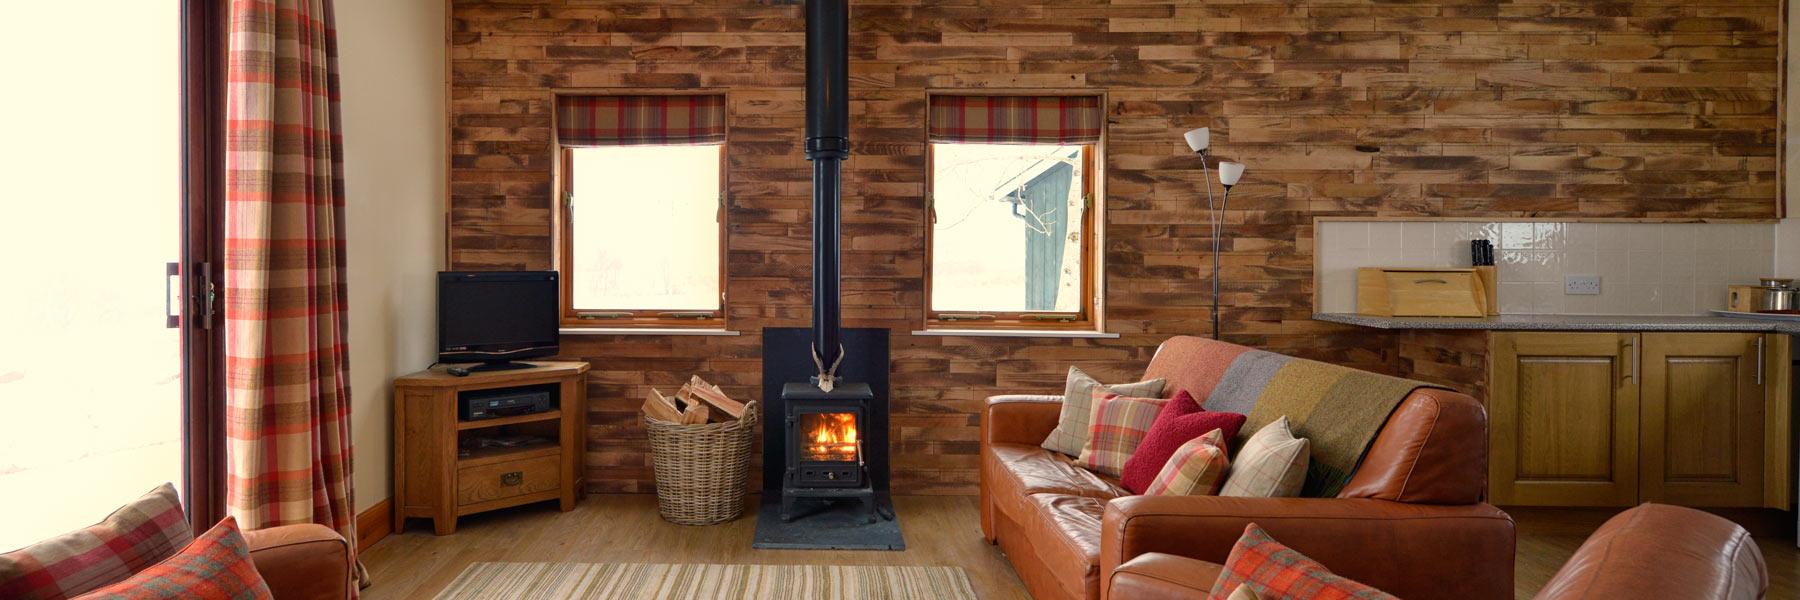 Drumcroy Lodges Aberfeldy interior